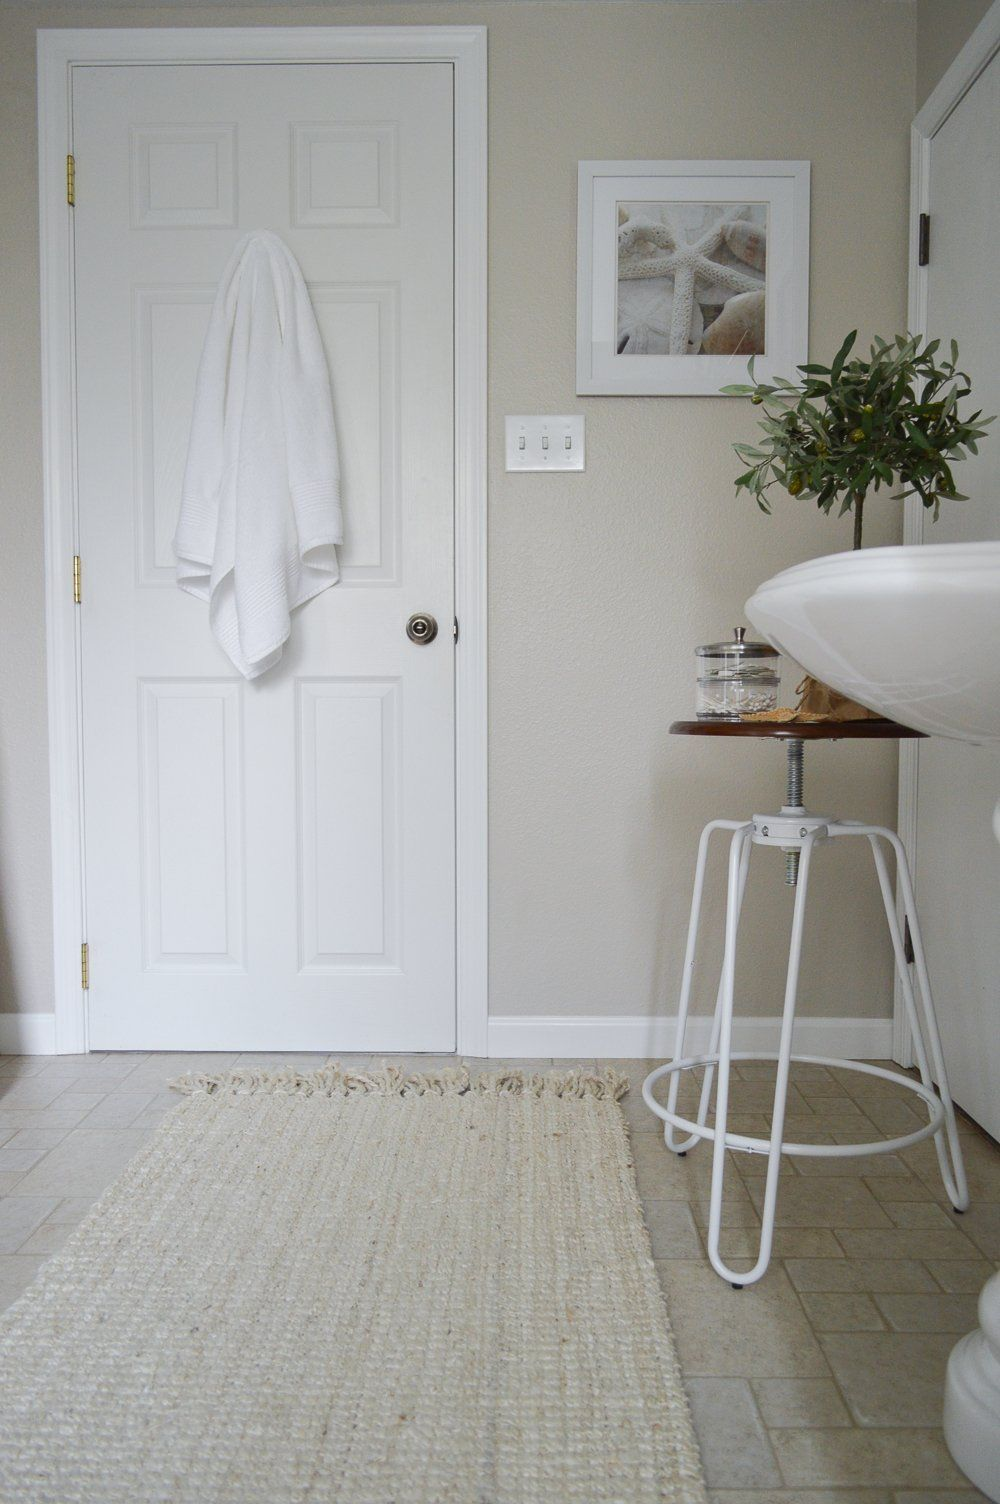 Cool 39 Cozy And Clean White Bathroom Decor Ideashttps://cekkarier.com/